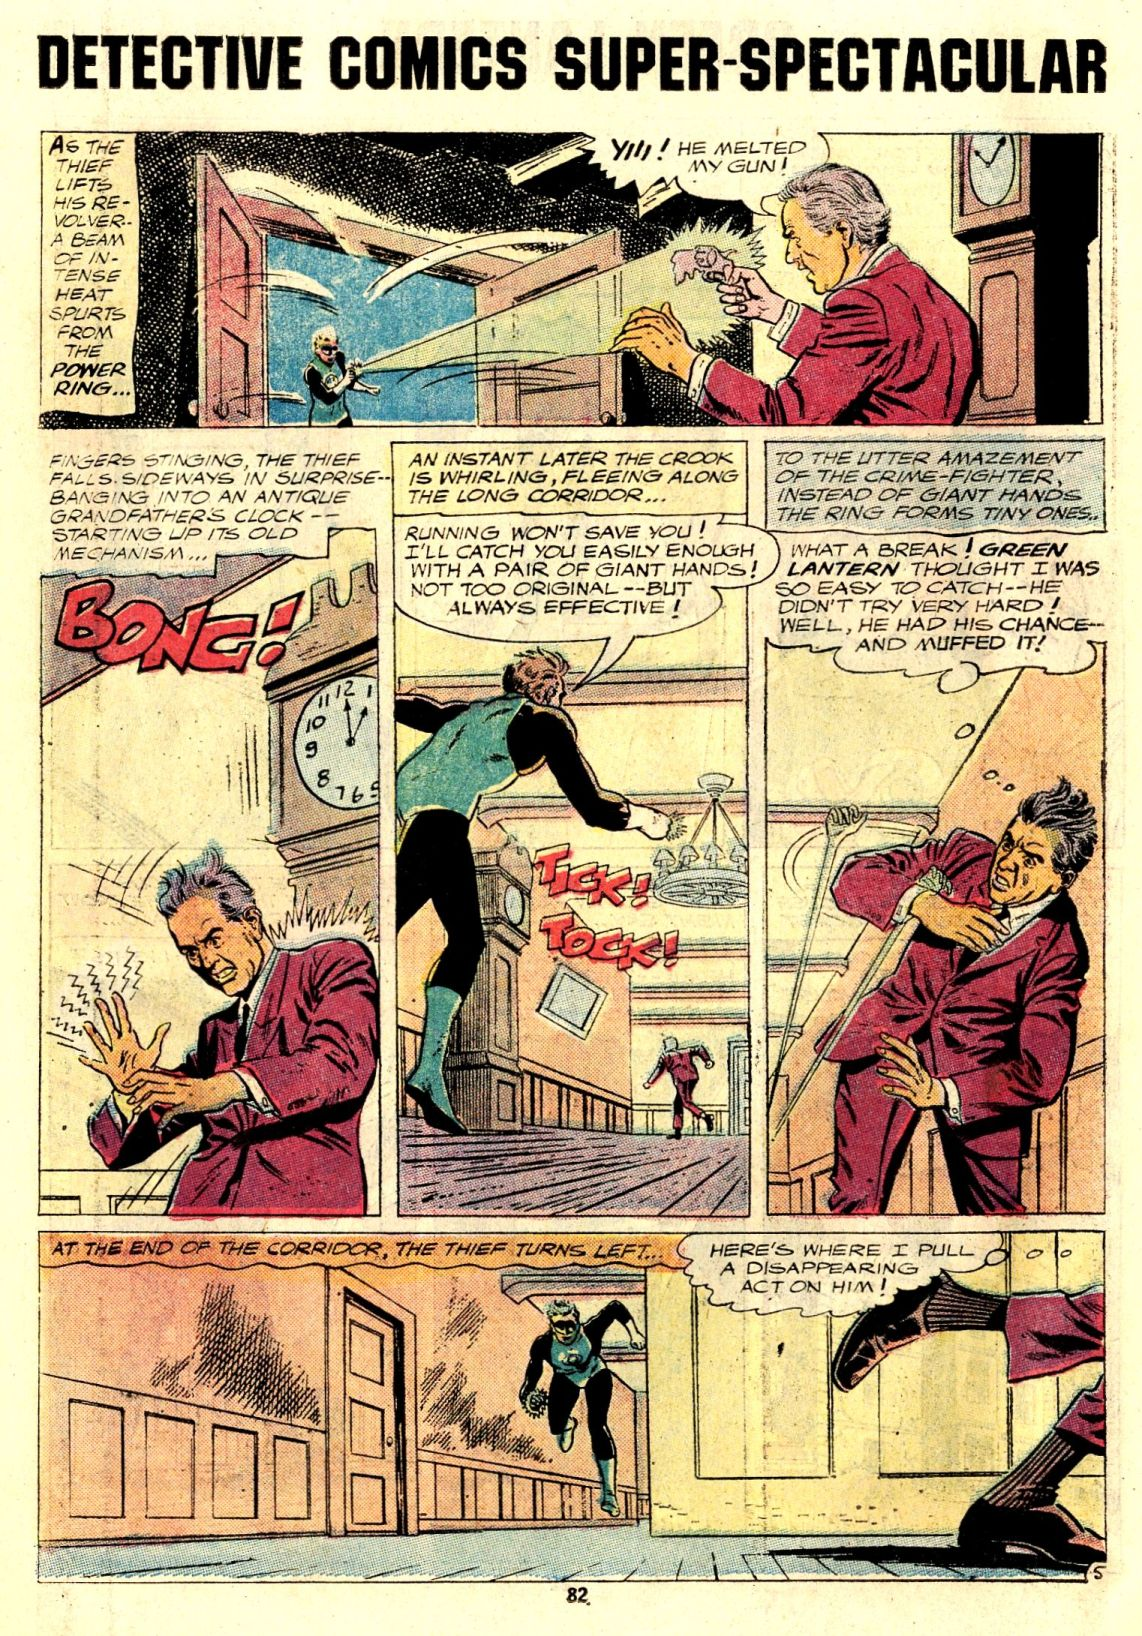 Detective Comics (1937) 438 Page 82